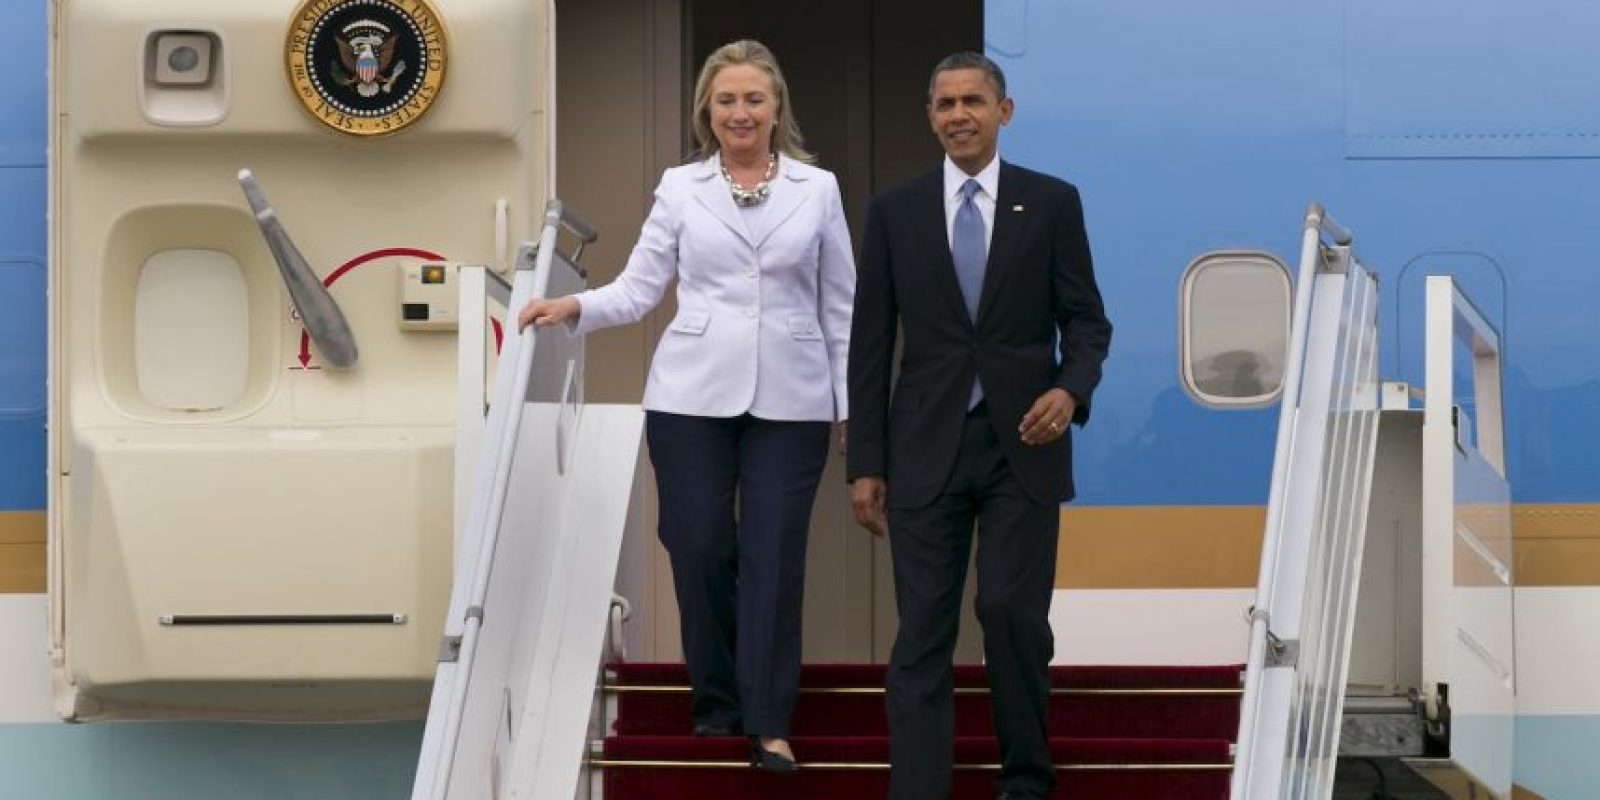 Representa al Partido Demócrata. Foto:Getty Images